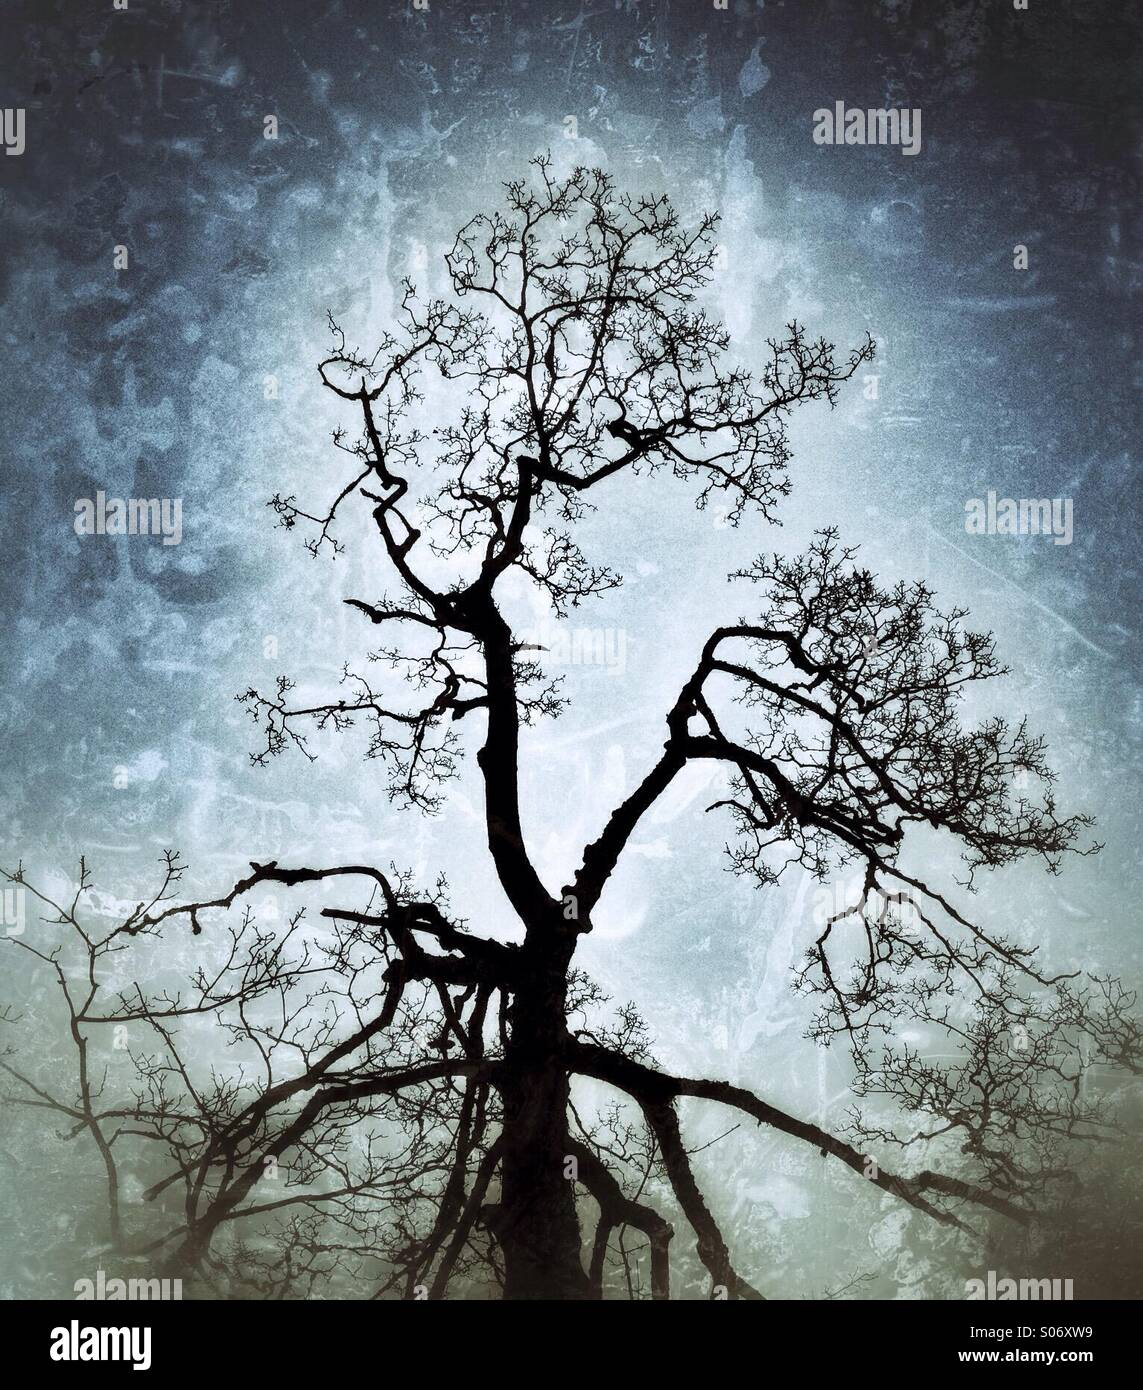 Toter Baum gegen einen strukturierten Himmel Stockbild